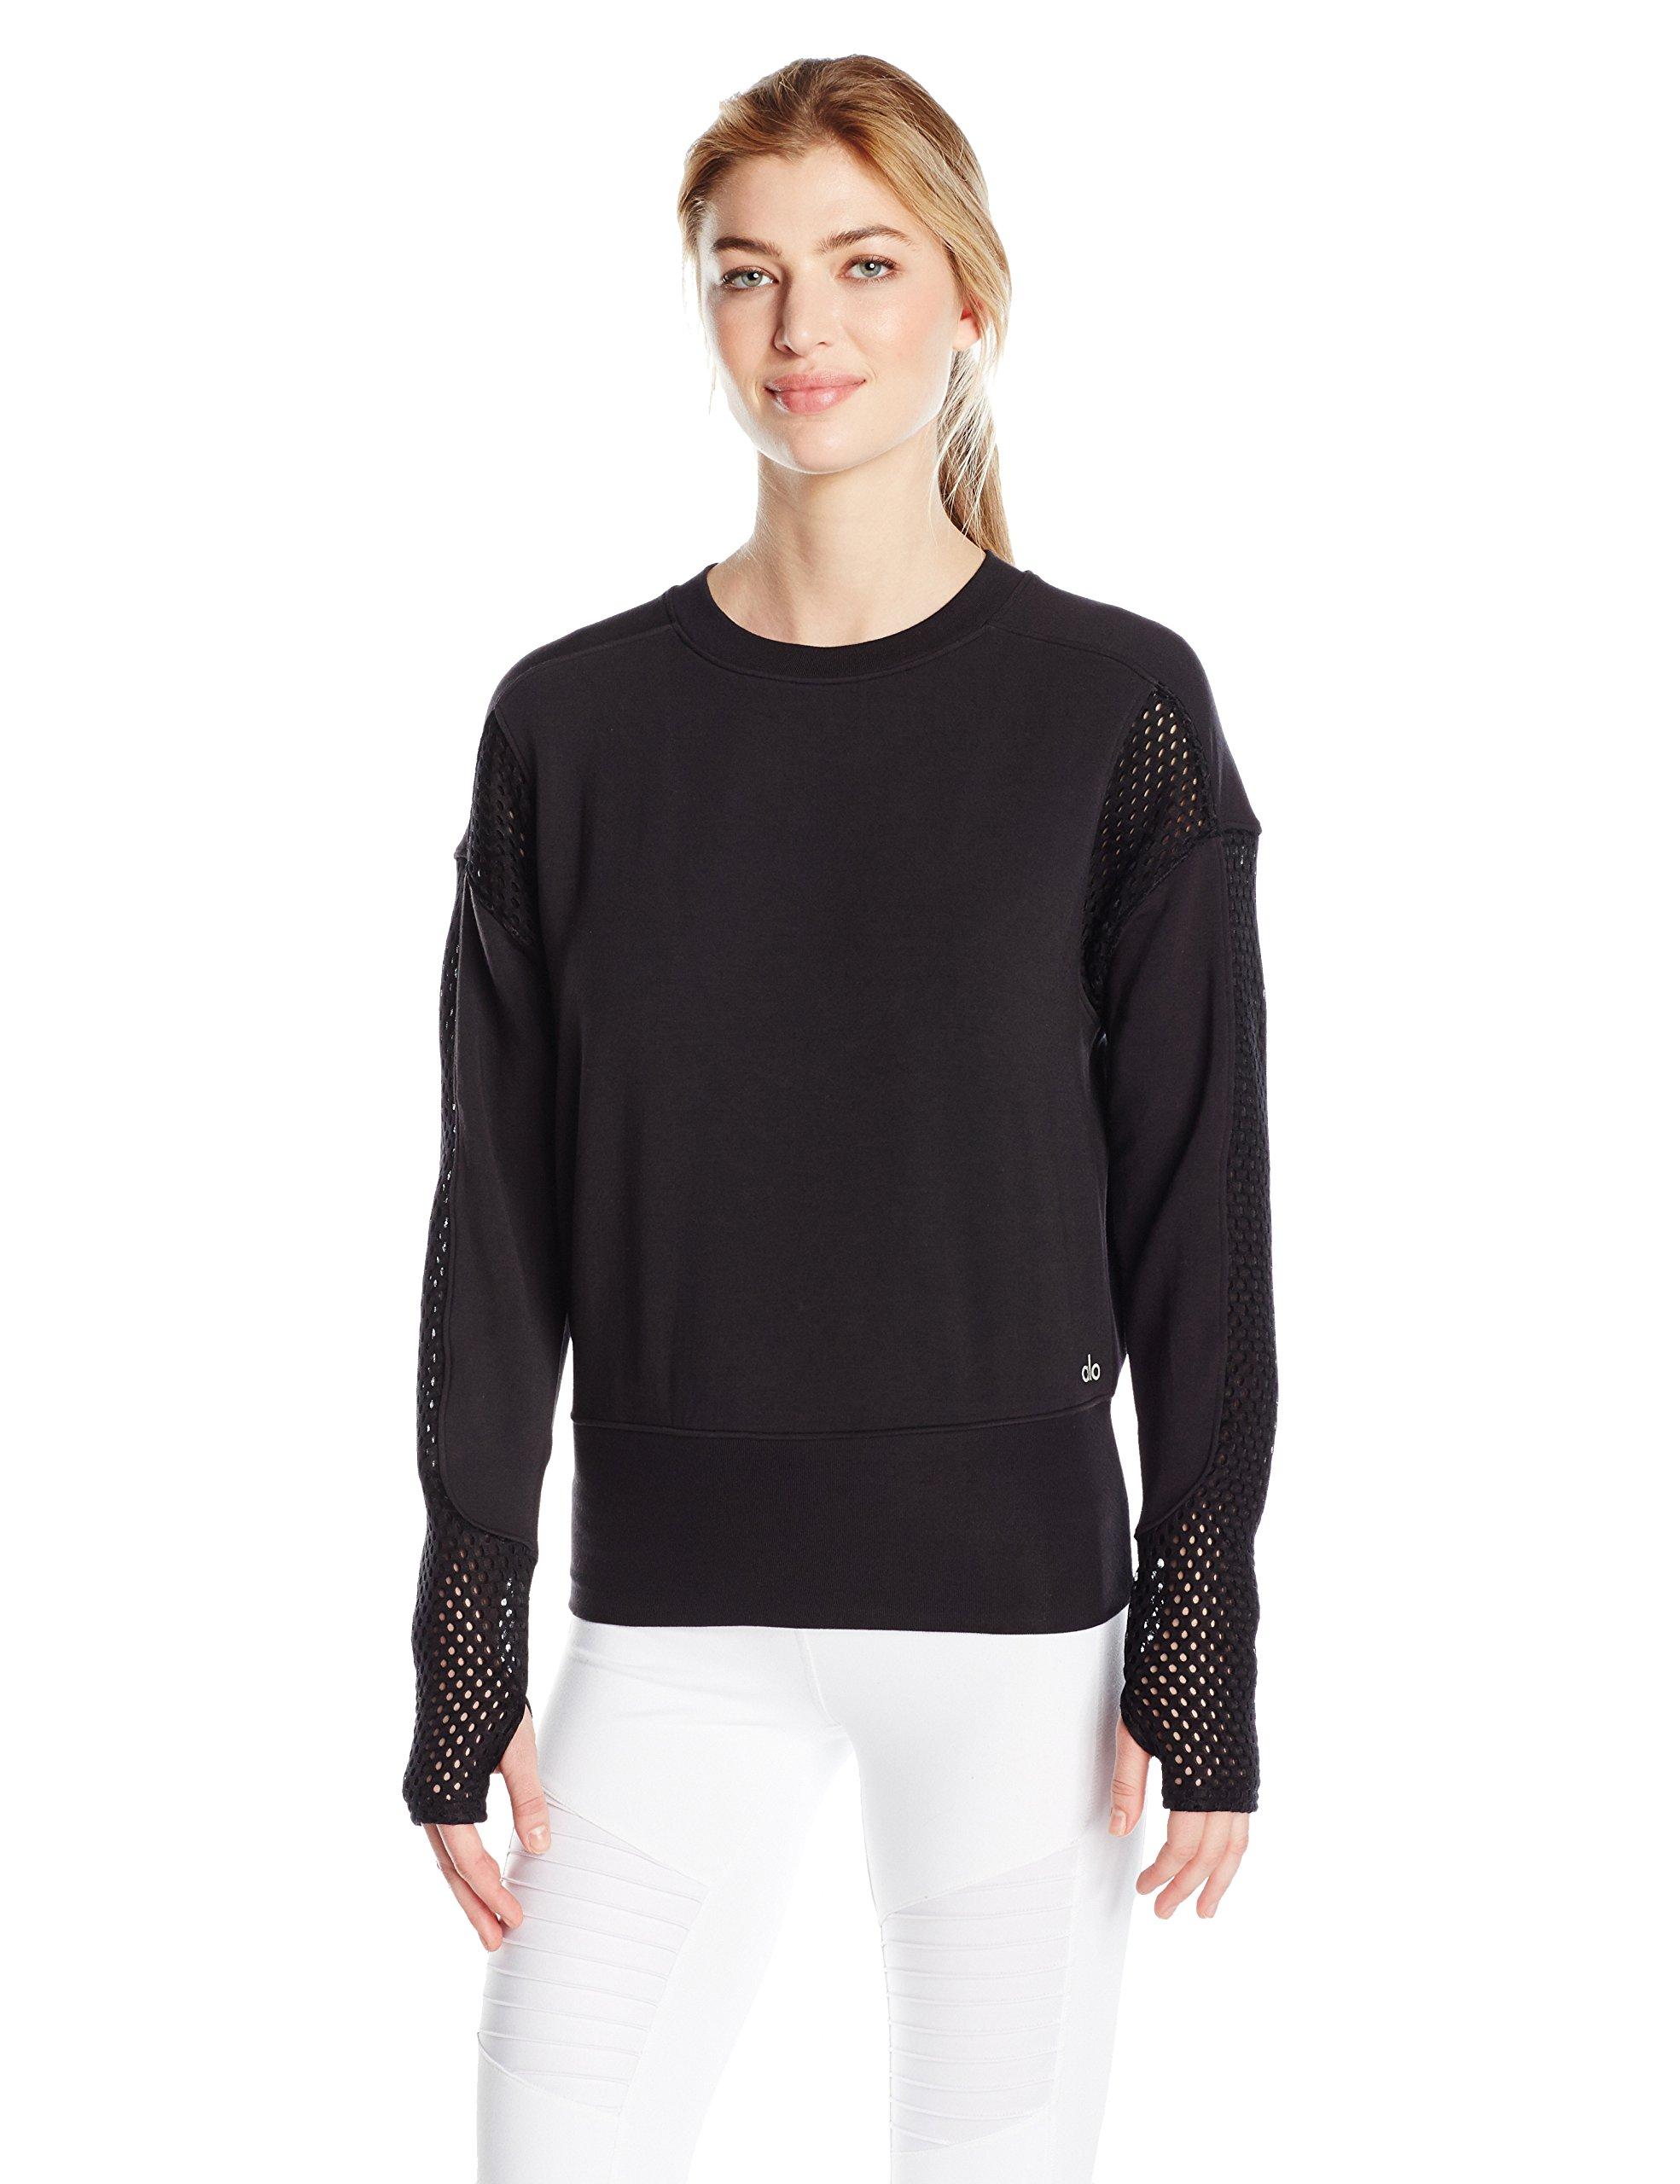 Alo Yoga Women's Formation Long Sleeve Top, Black, S